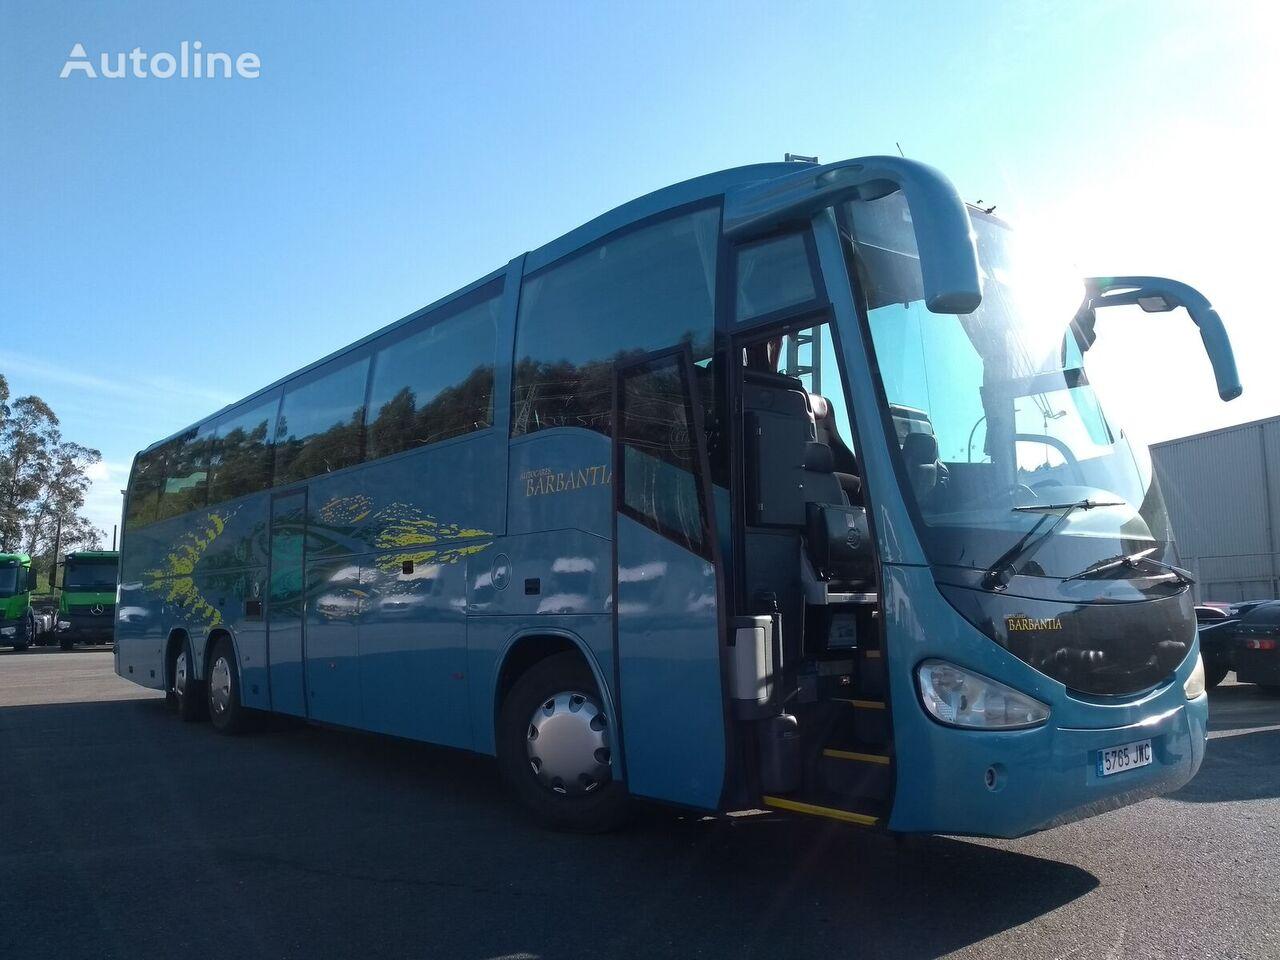 SCANIA Irizar new century coach bus